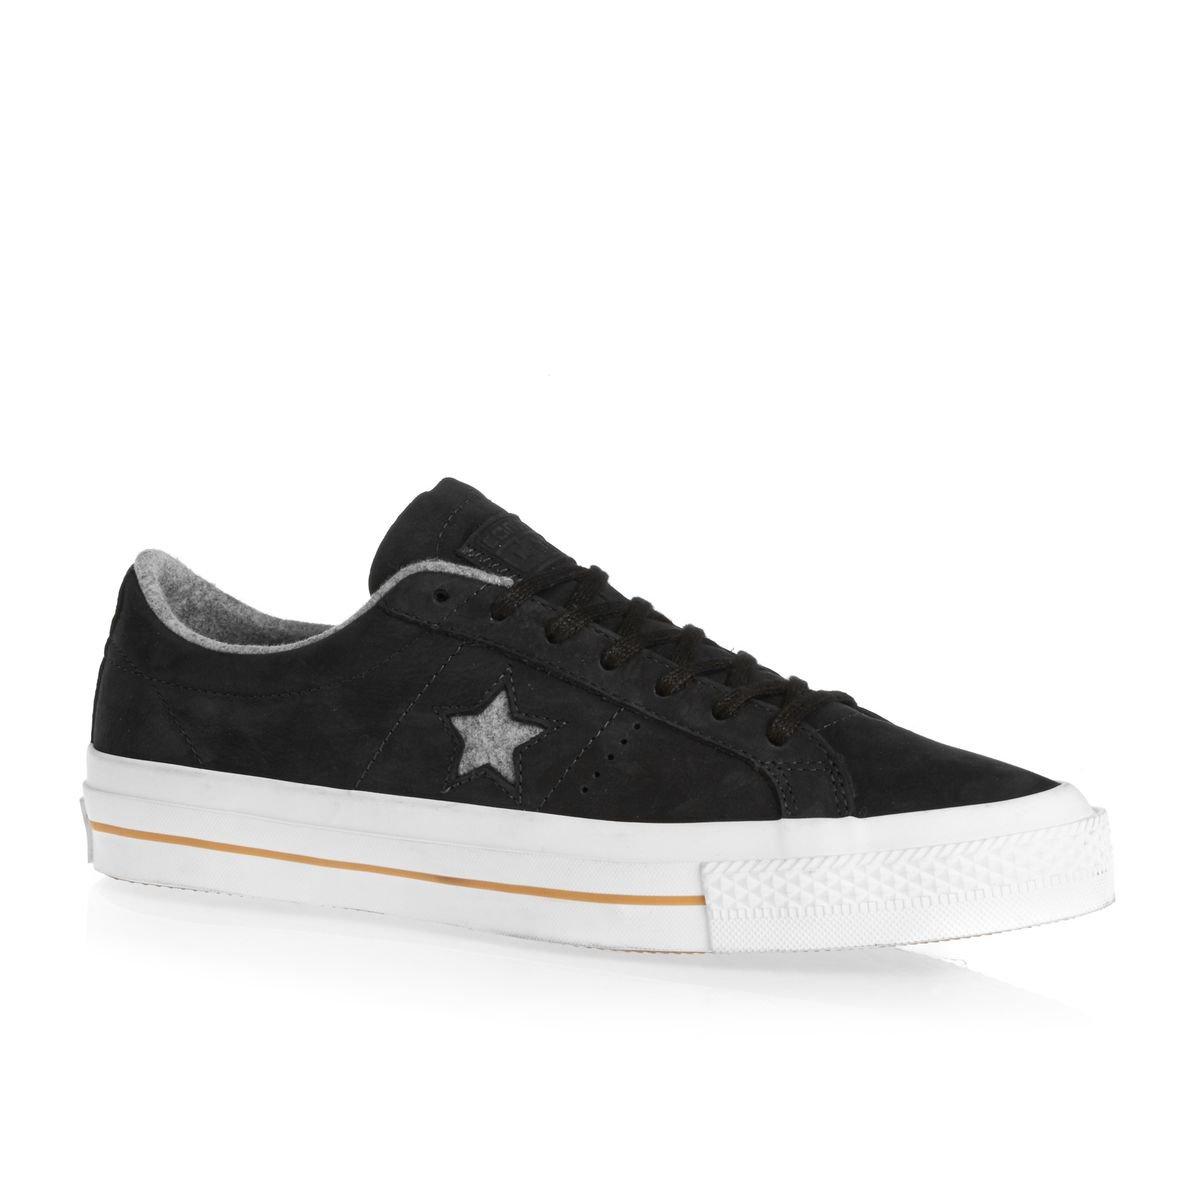 Converse Unisex One Star Pro Low Top Sneaker 45 M EU Black